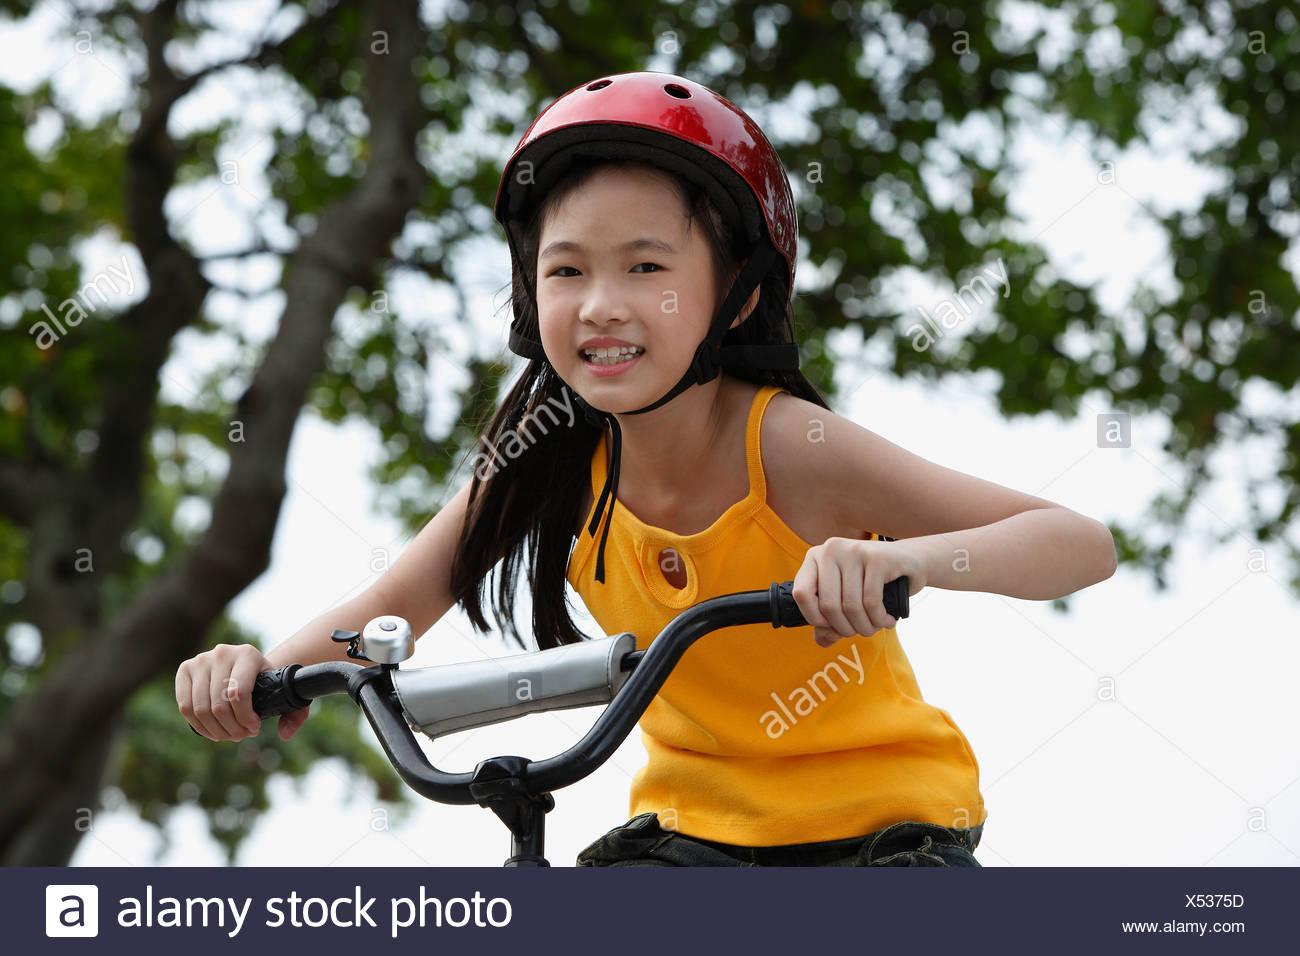 Young girl riding bike - Stock Image